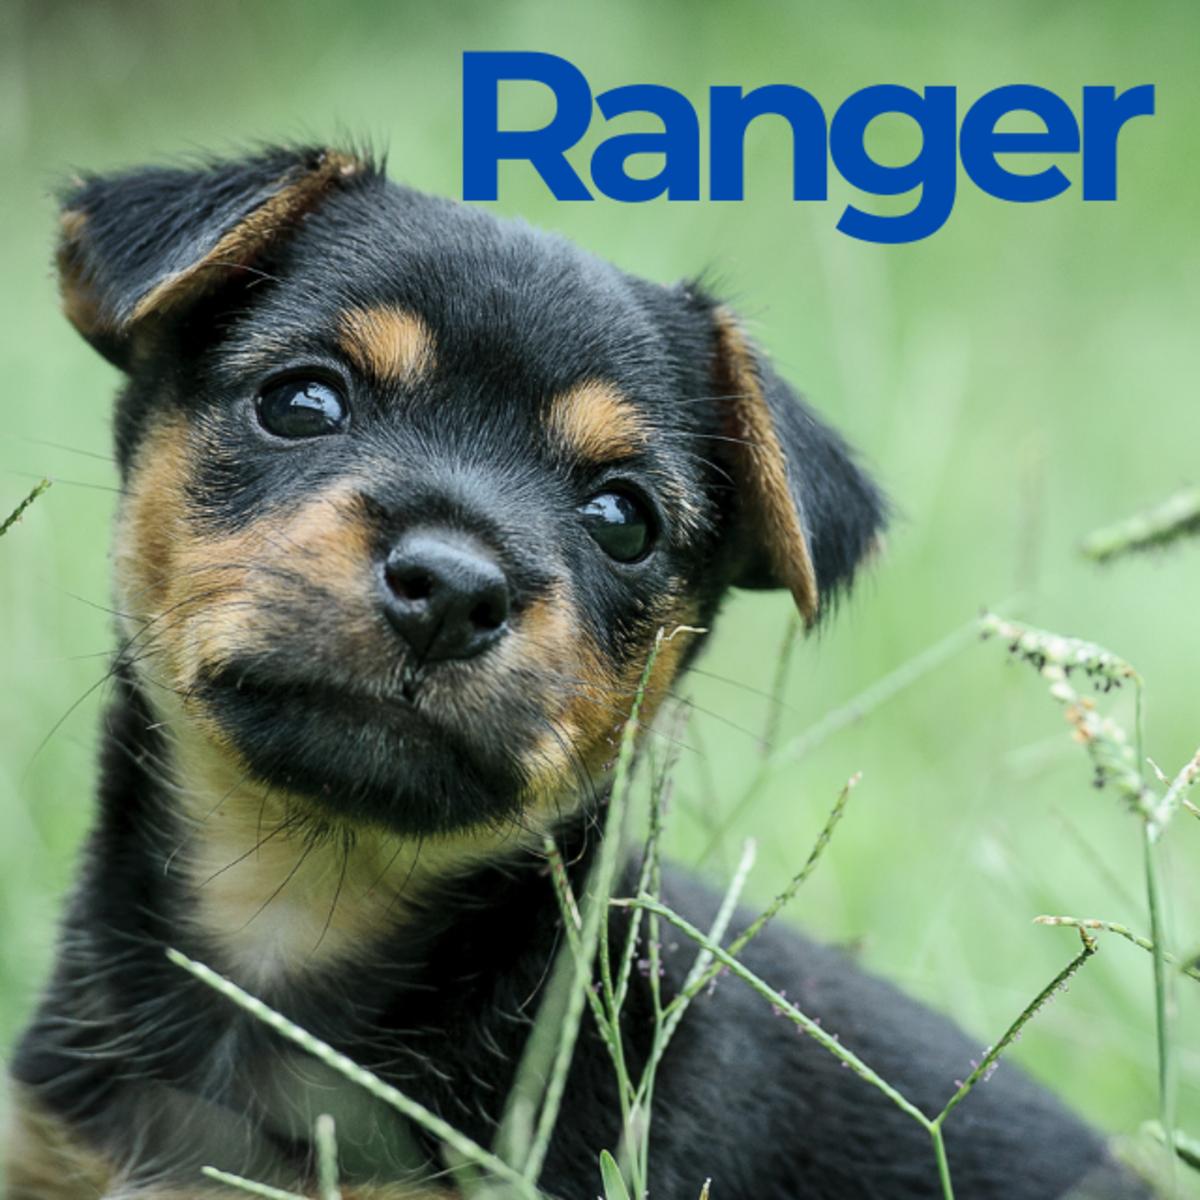 Puppy named Ranger